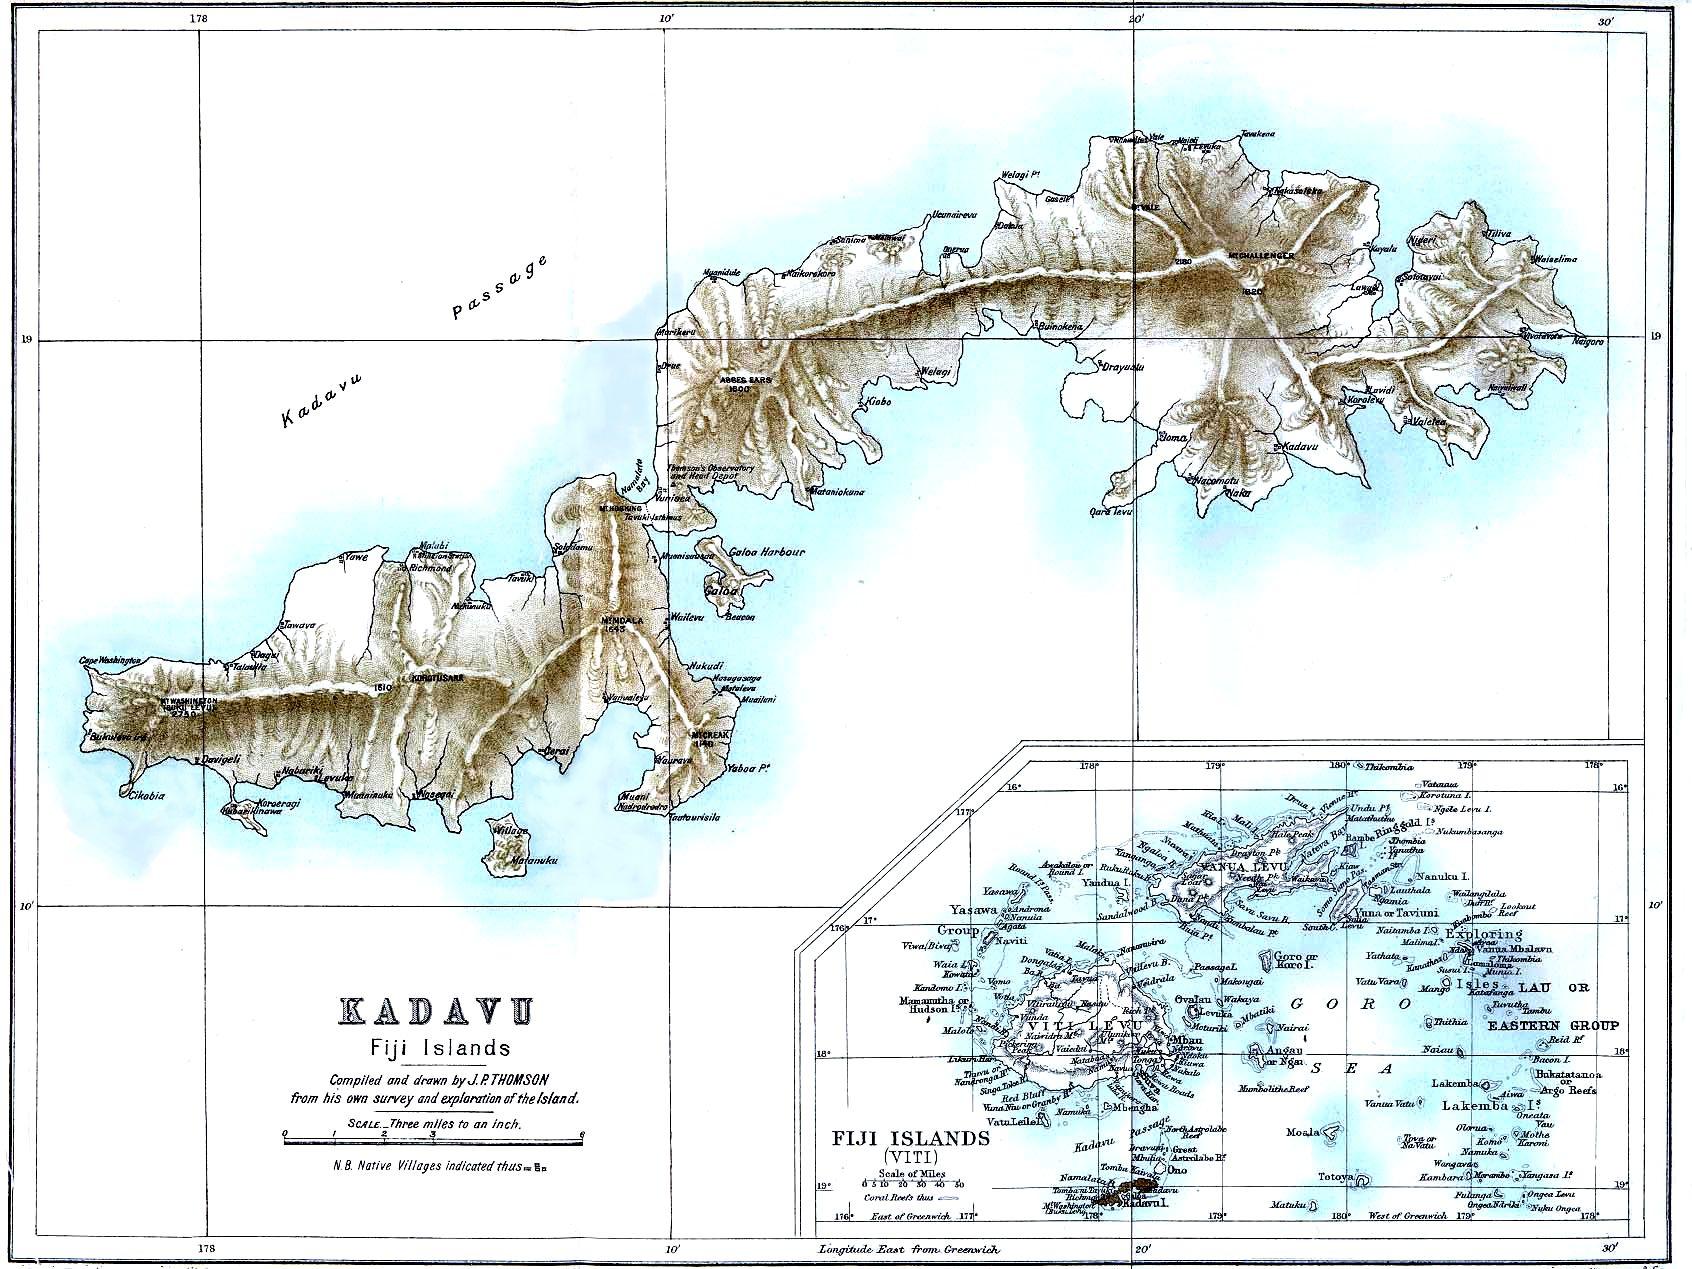 Kadavu Island Fiji  city photos : Original file  1,692 × 1,269 pixels, file size: 368 KB, MIME type ...